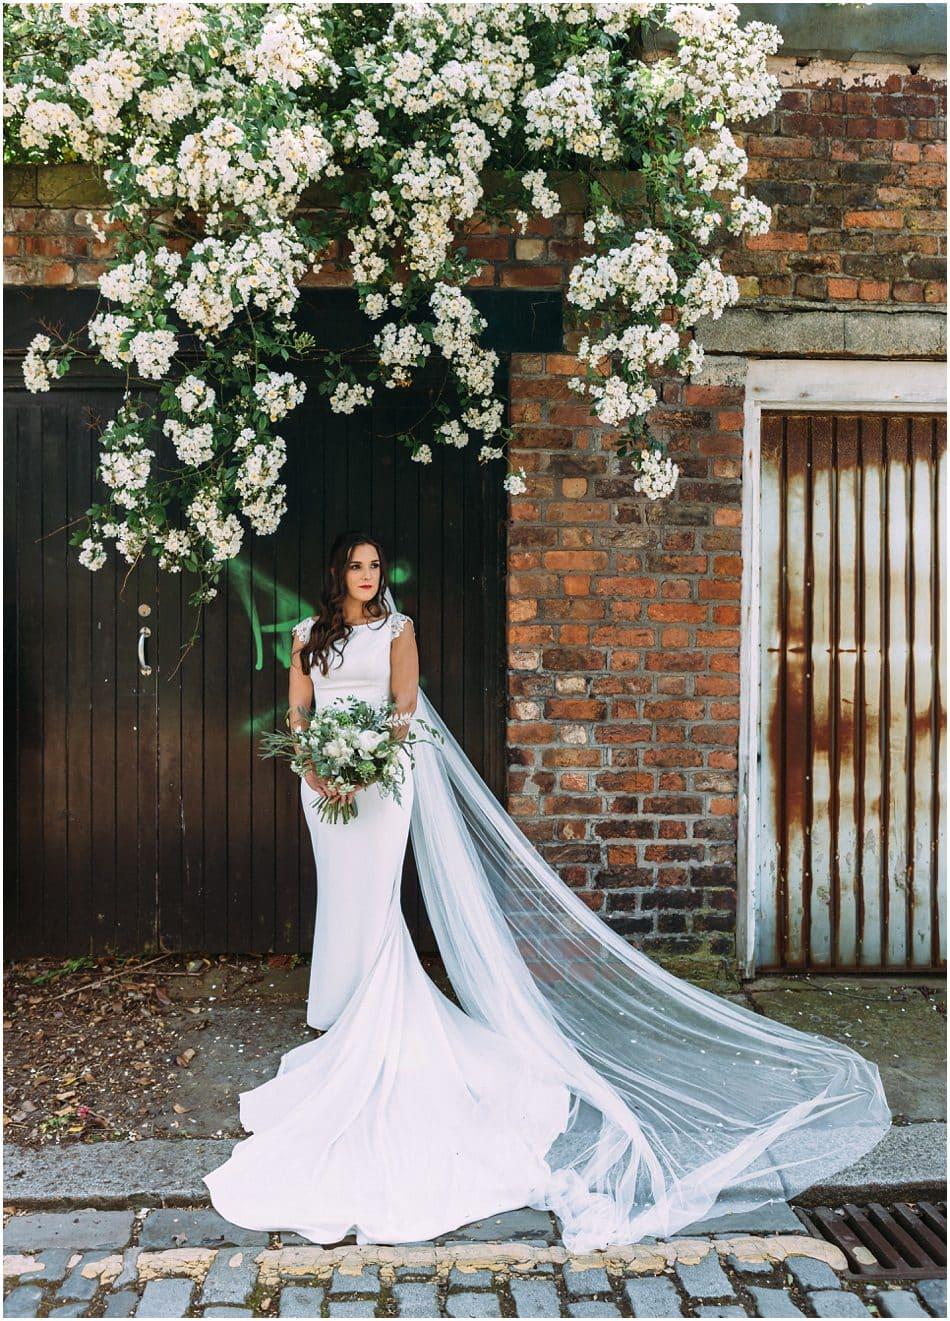 Siren Liverpool wedding photography; Bride with floor length veil